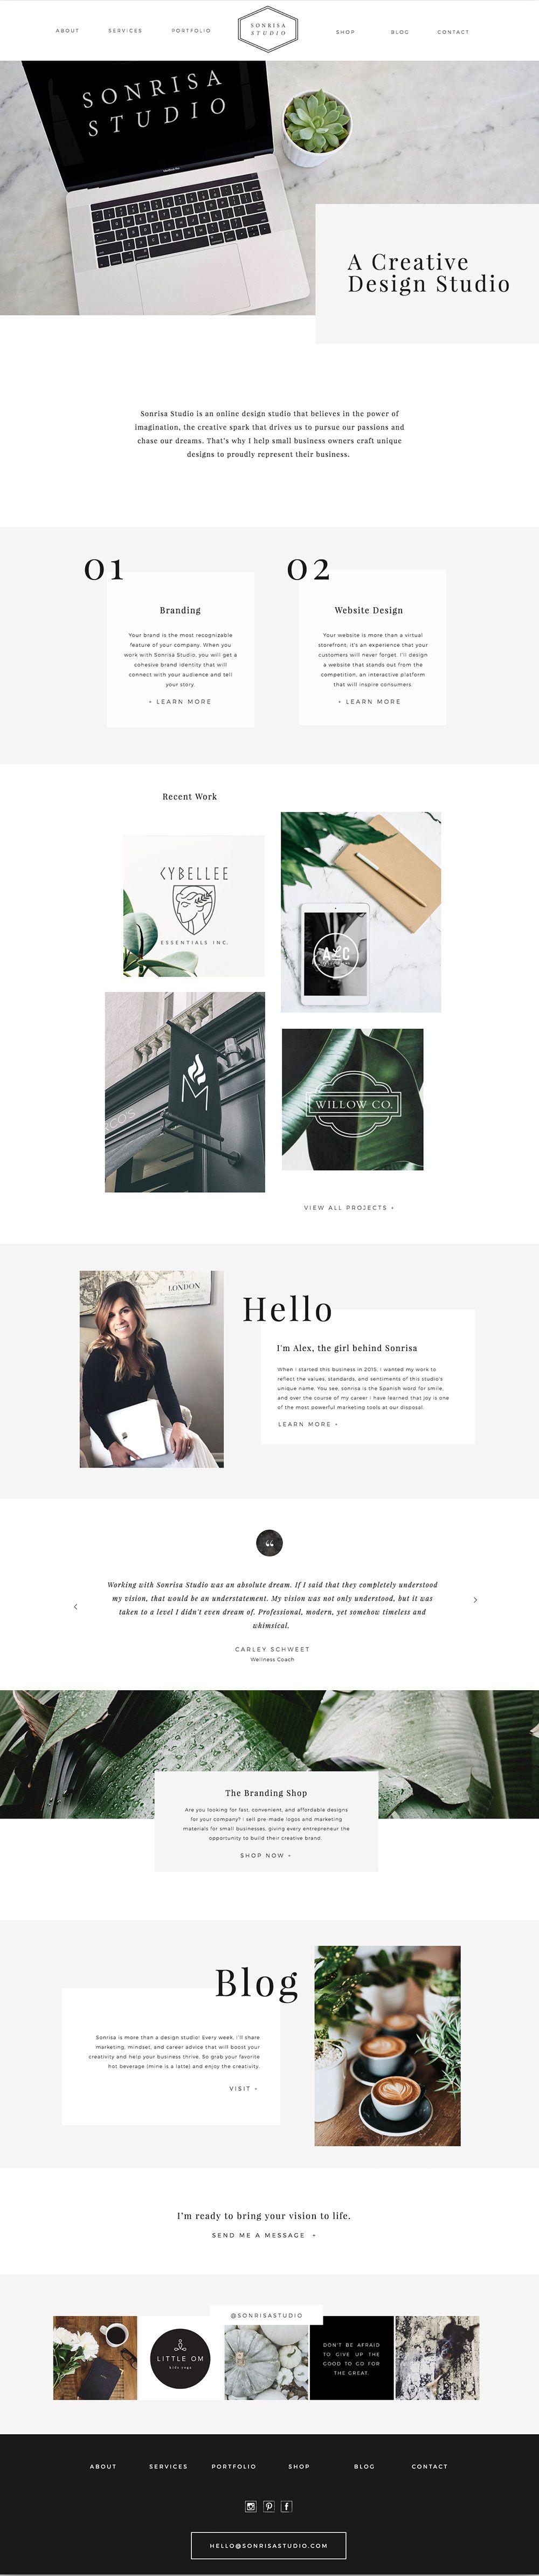 Simple Modern Fresh Website Design For A Creative Design Studio Plant Based Imagery D Website Color Schemes Portfolio Website Design Print Portfolio Design